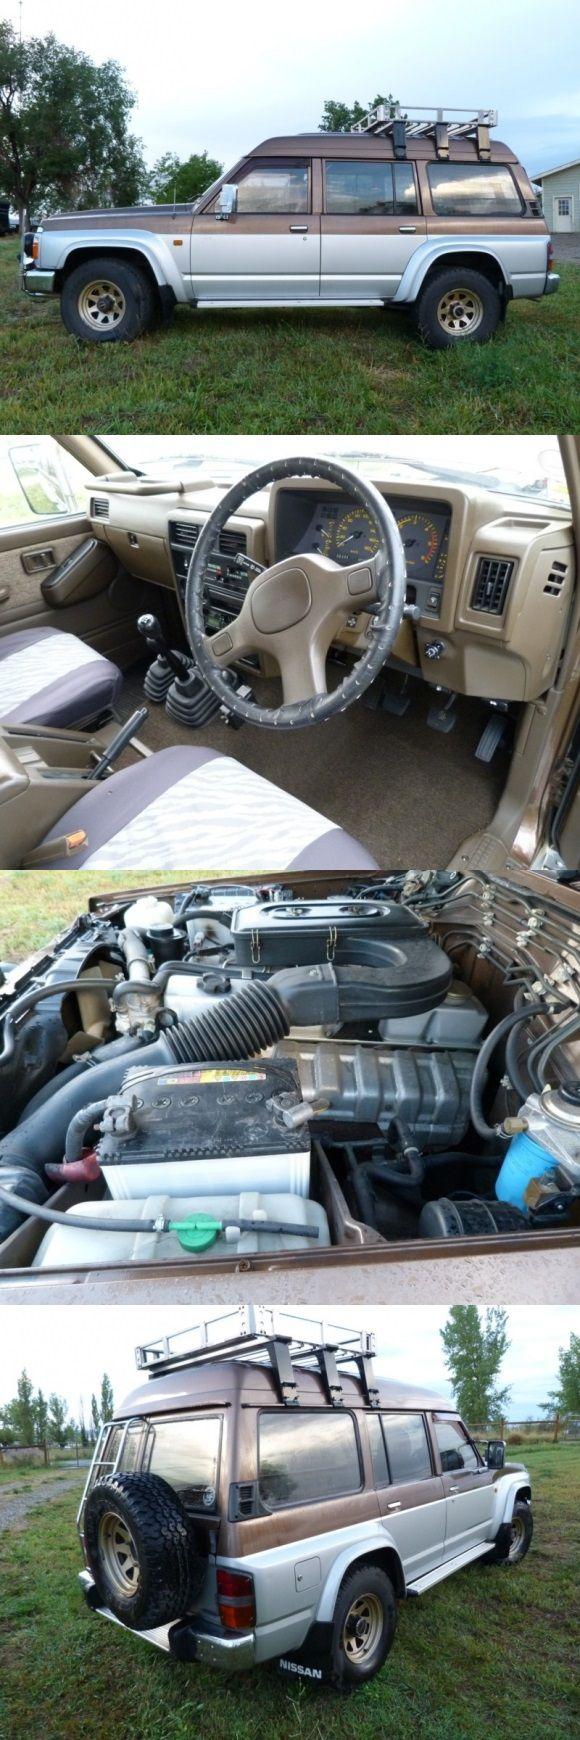 1988 Nissan Safari 4×4